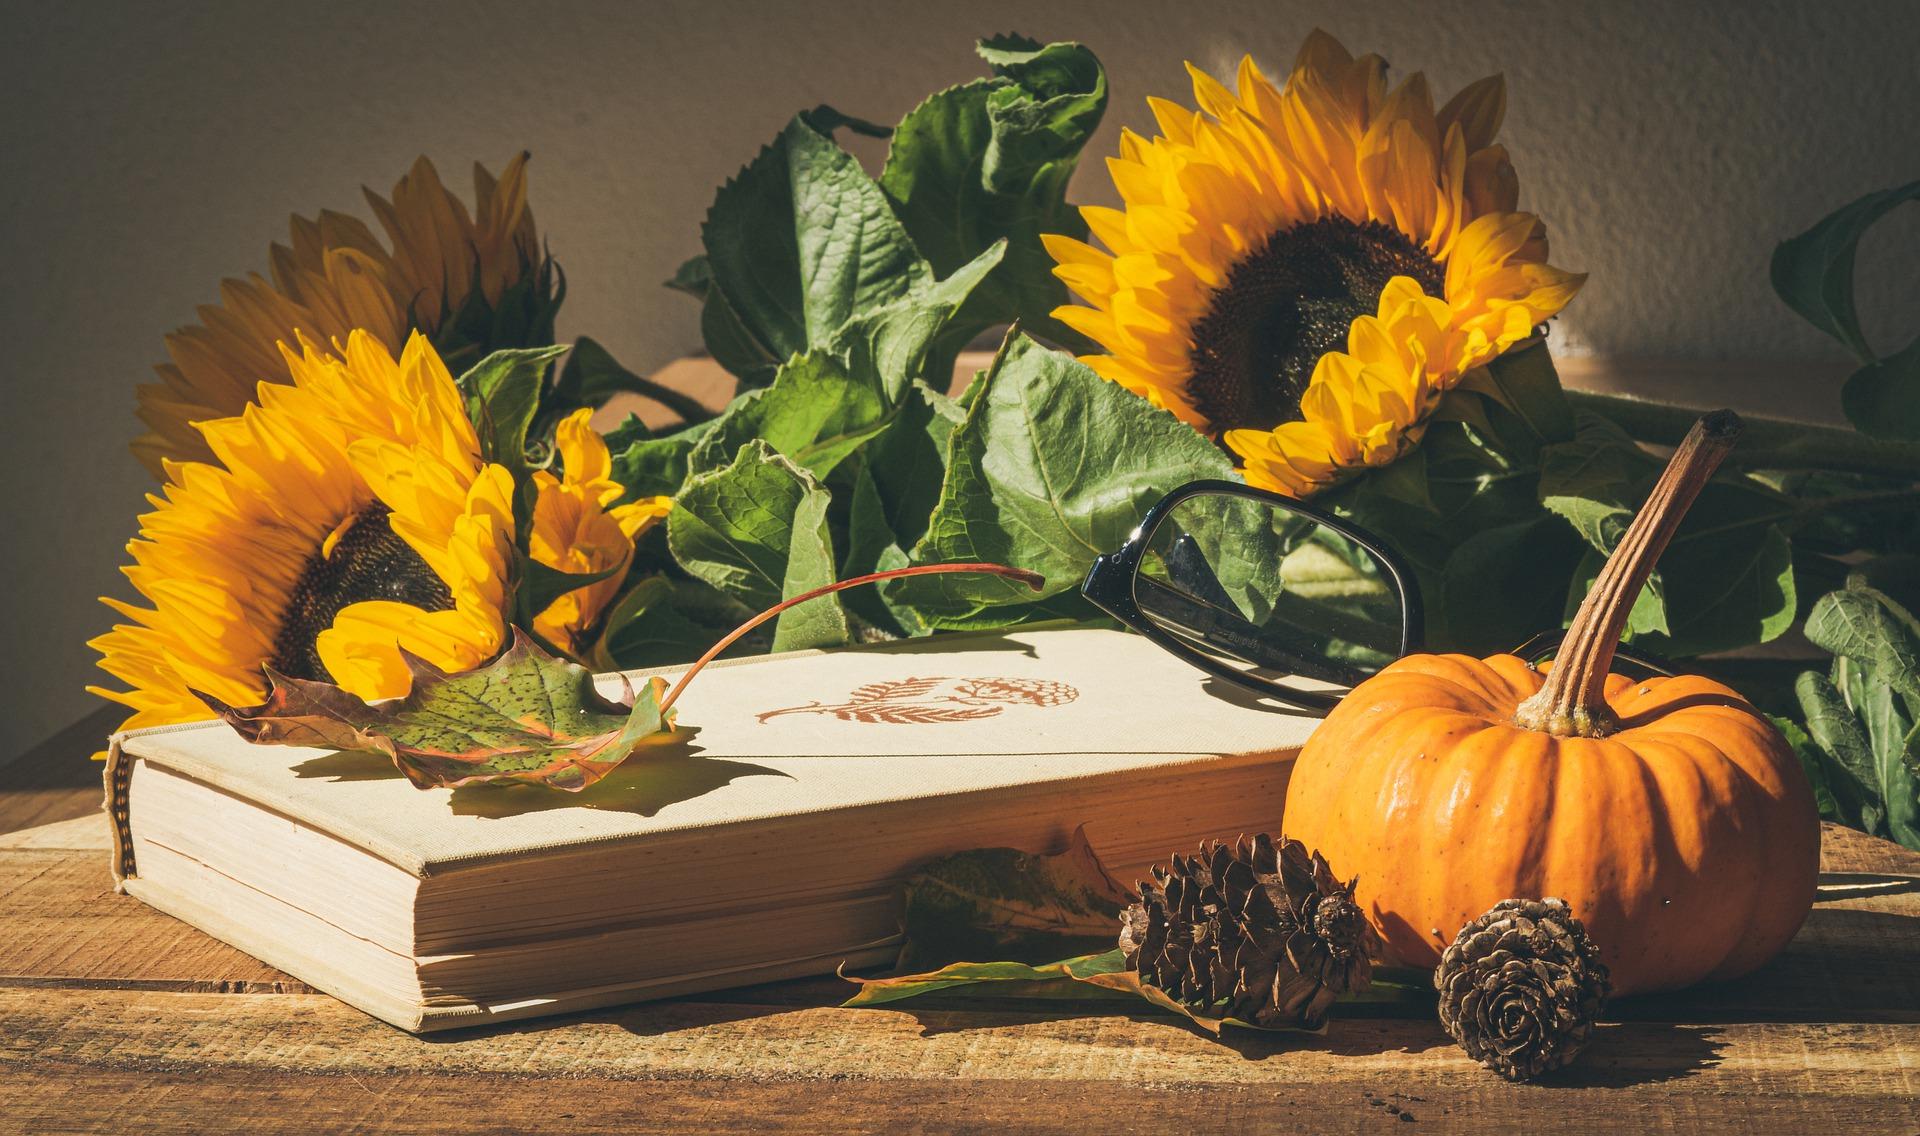 Photo of Pumpkins & Sunflowers